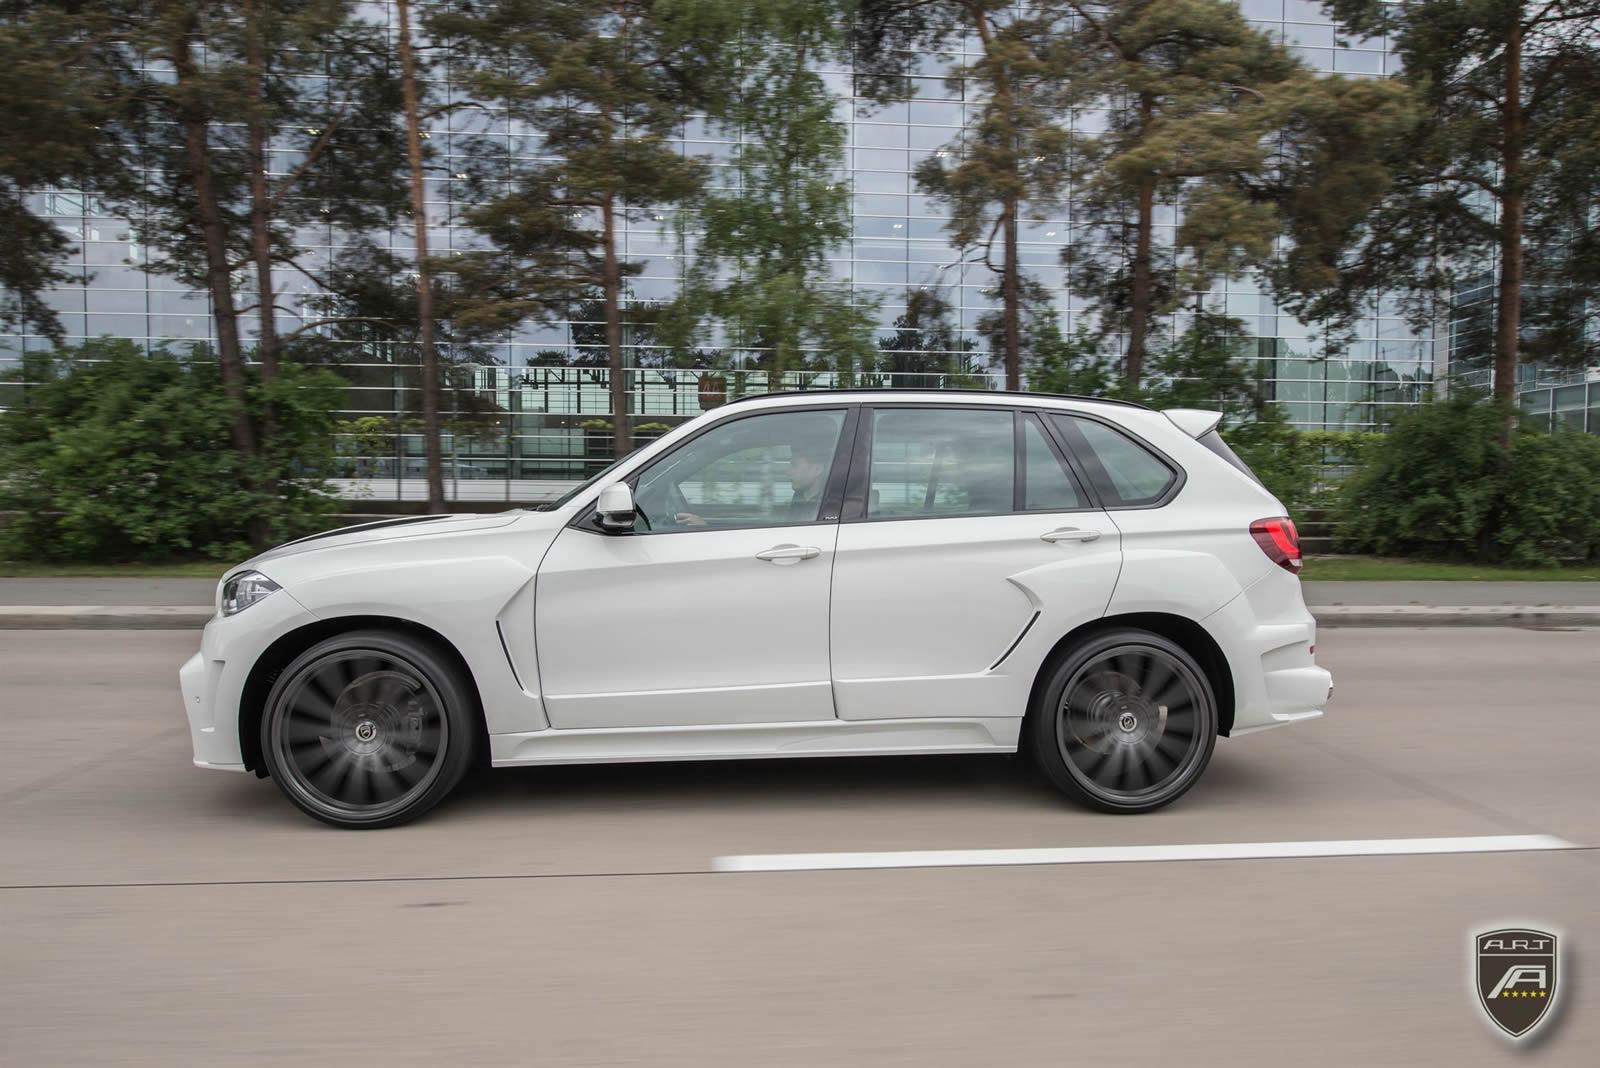 Bmw X5 Xdrive50i Sounds Amazing With Ac Schnitzer S New Exhaust